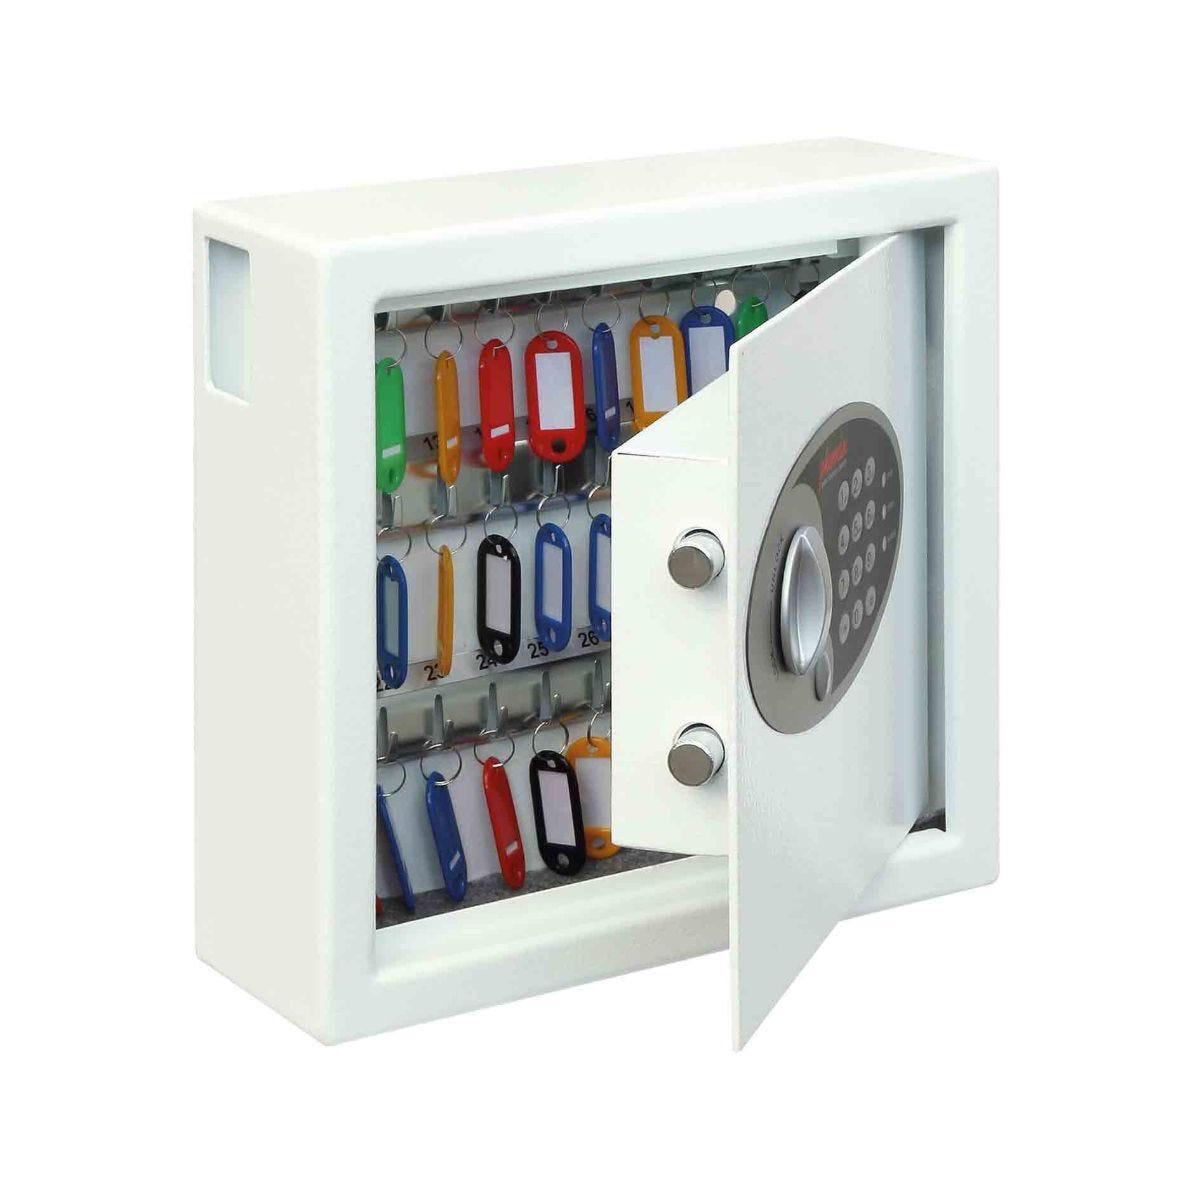 Phoenix Cygnus KS0031E Key Deposit Safe with Electronic Lock 30 Hook